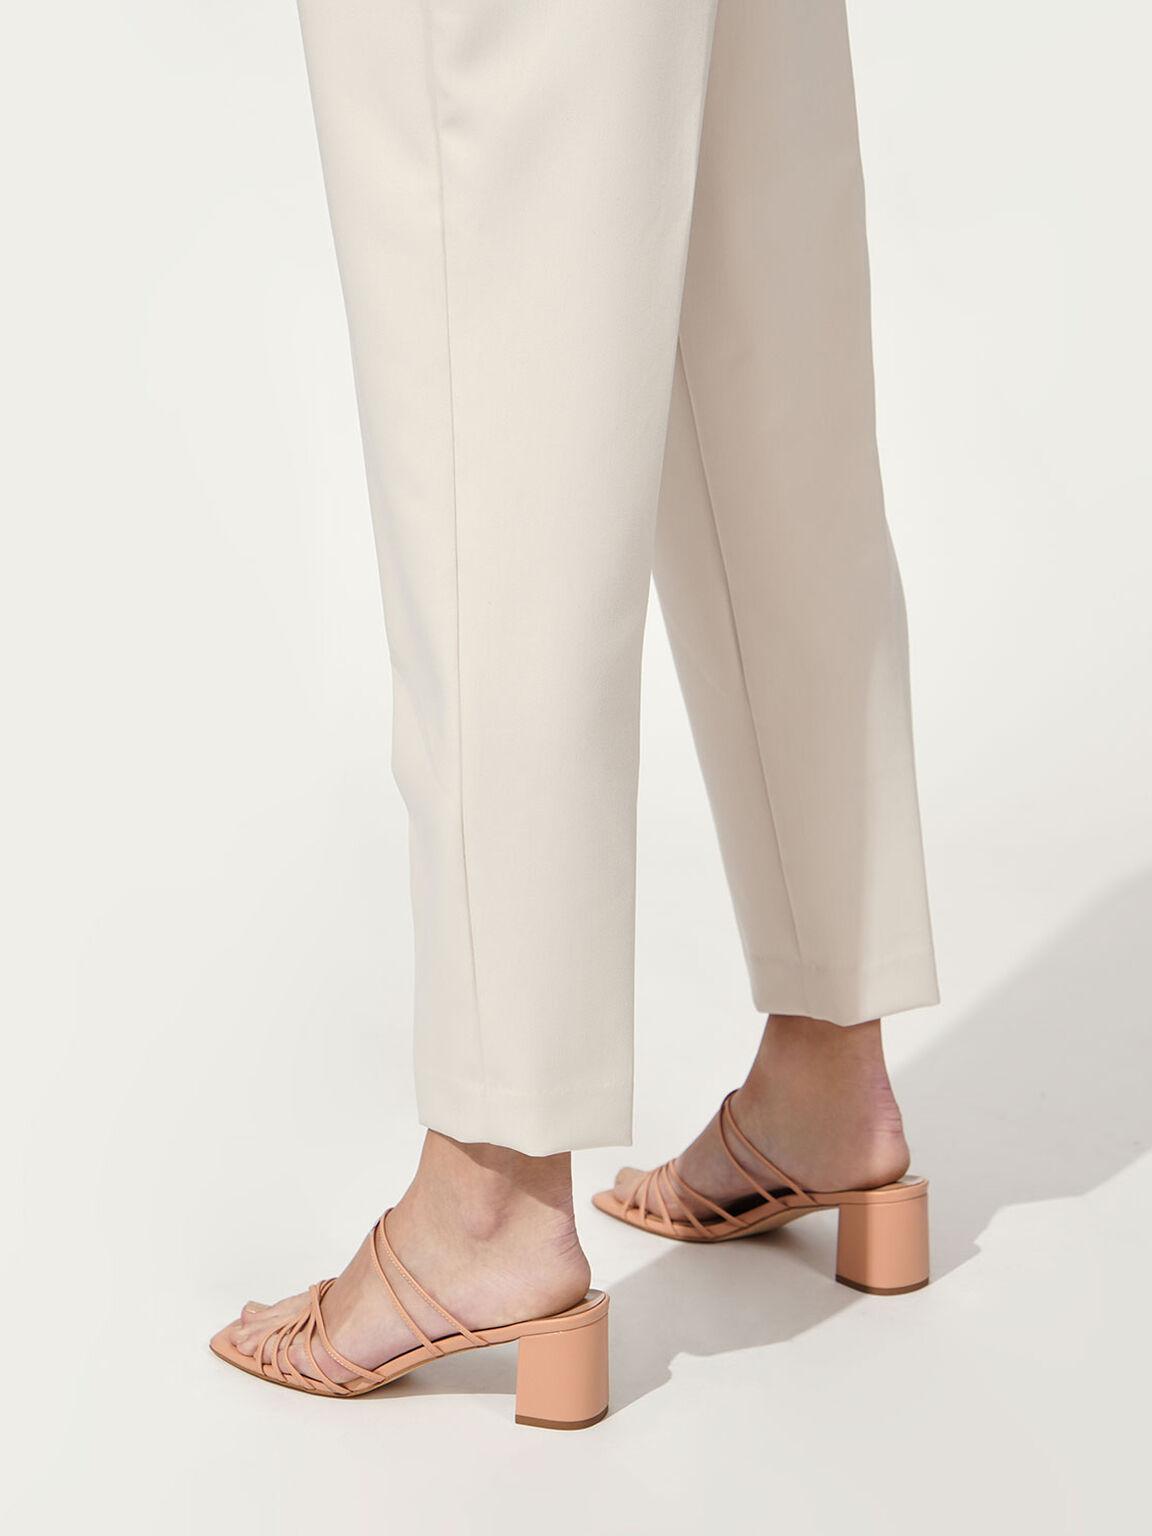 Strappy Square Toe Sandals, Nude, hi-res